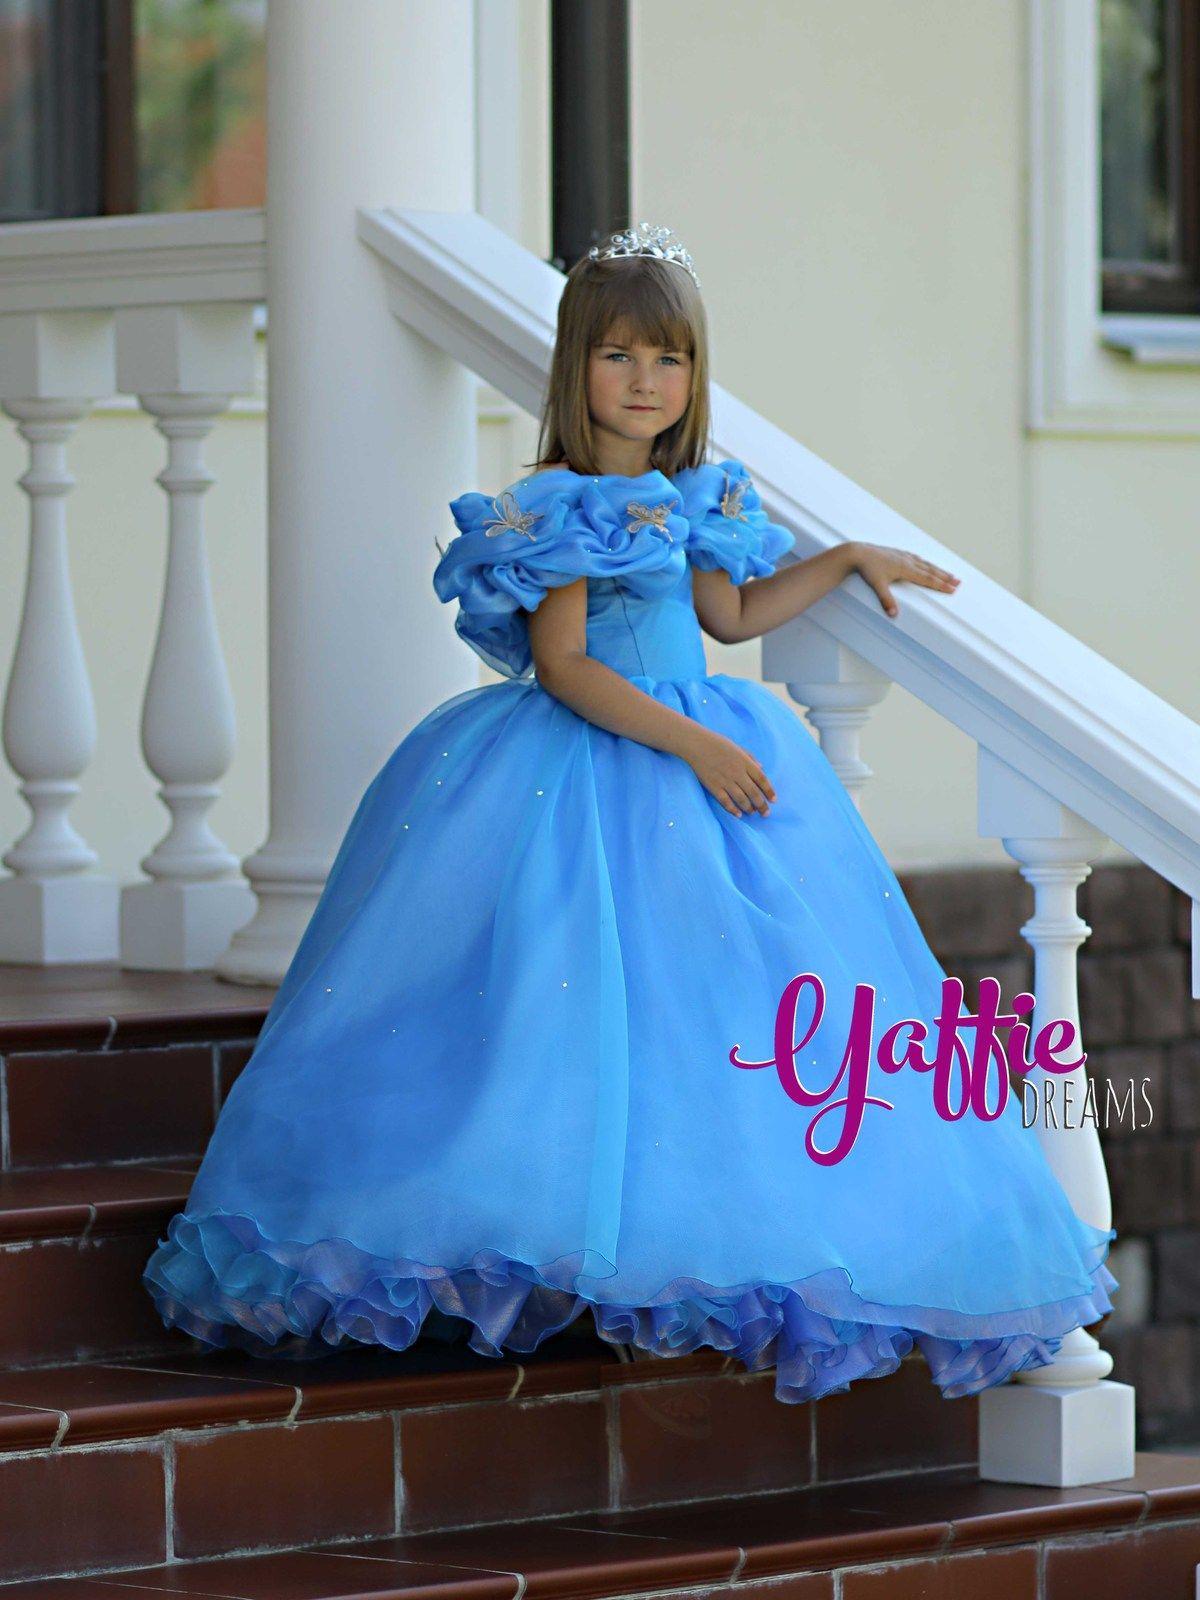 Cinderella 2015 movie dress Disney princess ball gown Halloween ...